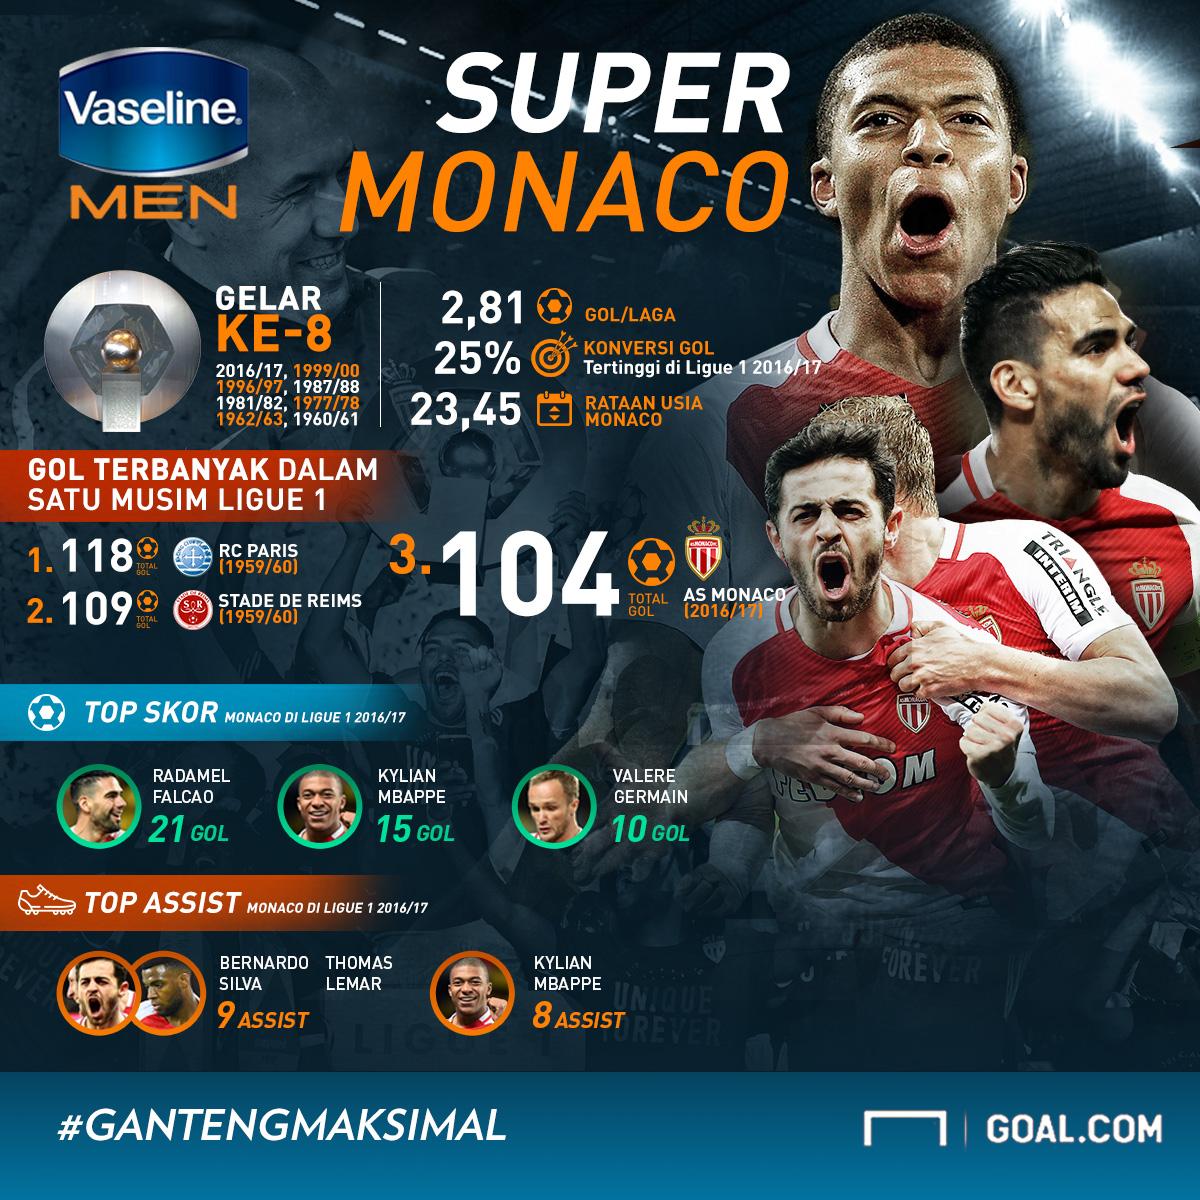 Vaseline Super Monaco Infografis